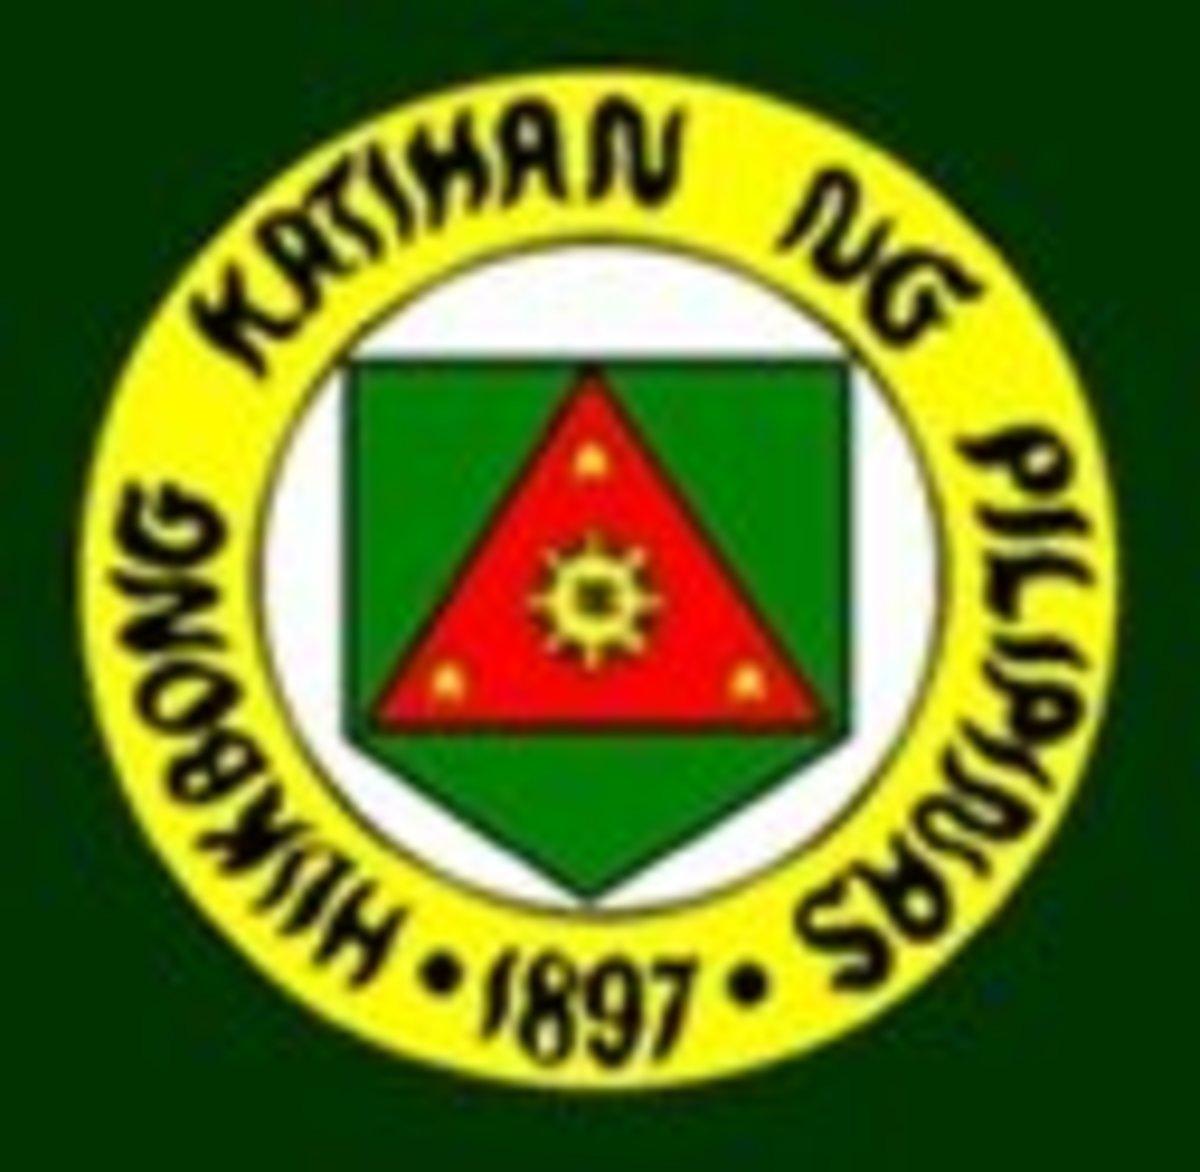 Philippine Army